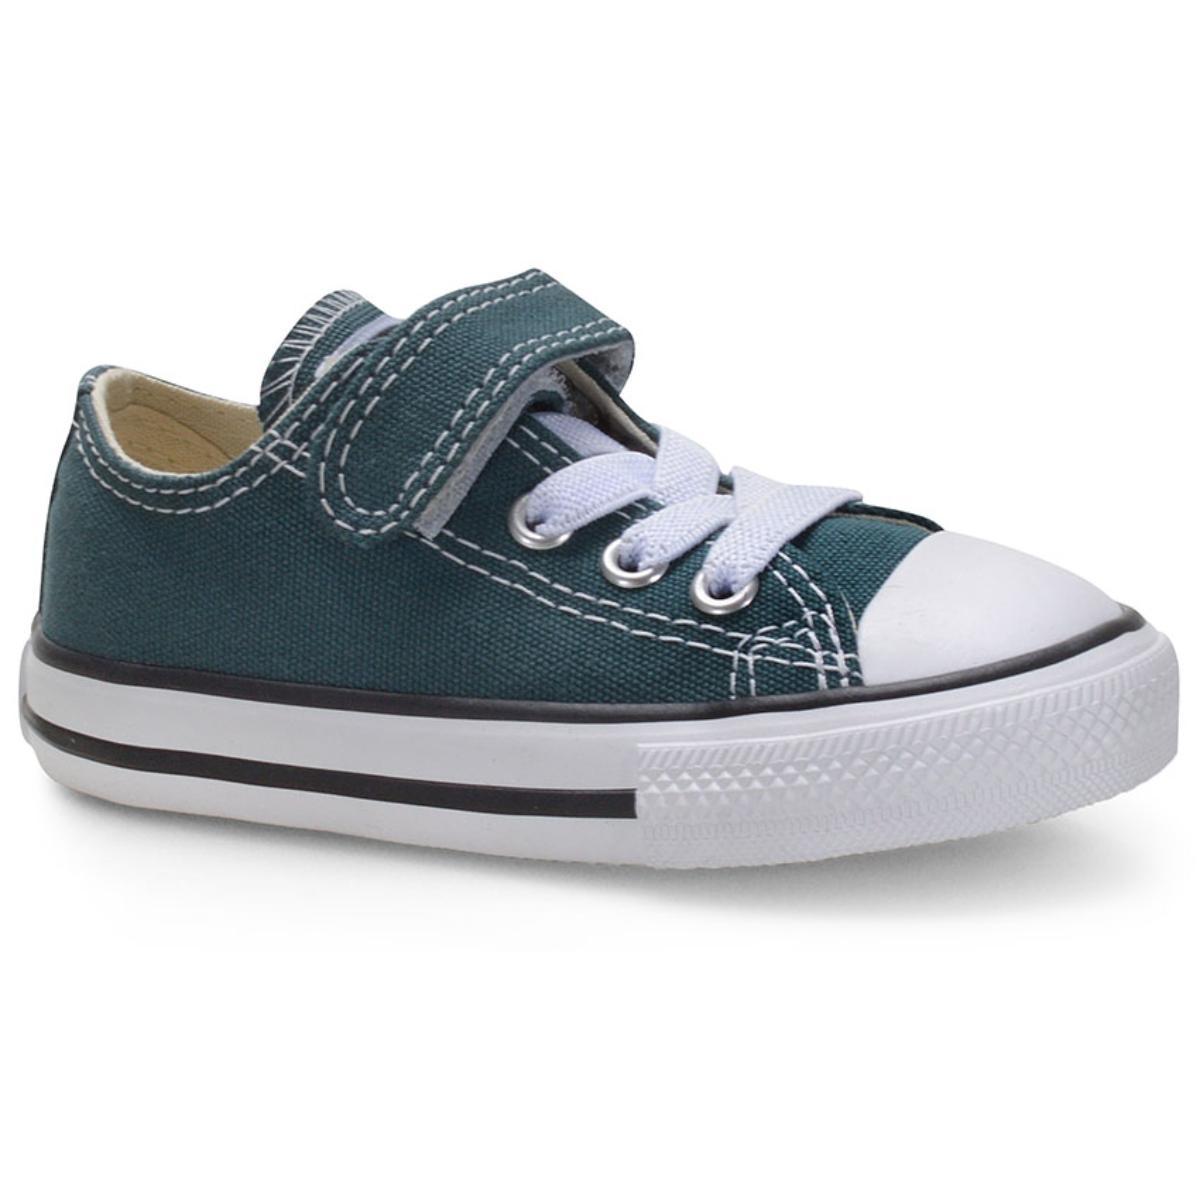 Tênis Masc Infantil All Star Ck08150003 Verde Escuro/preto/branco